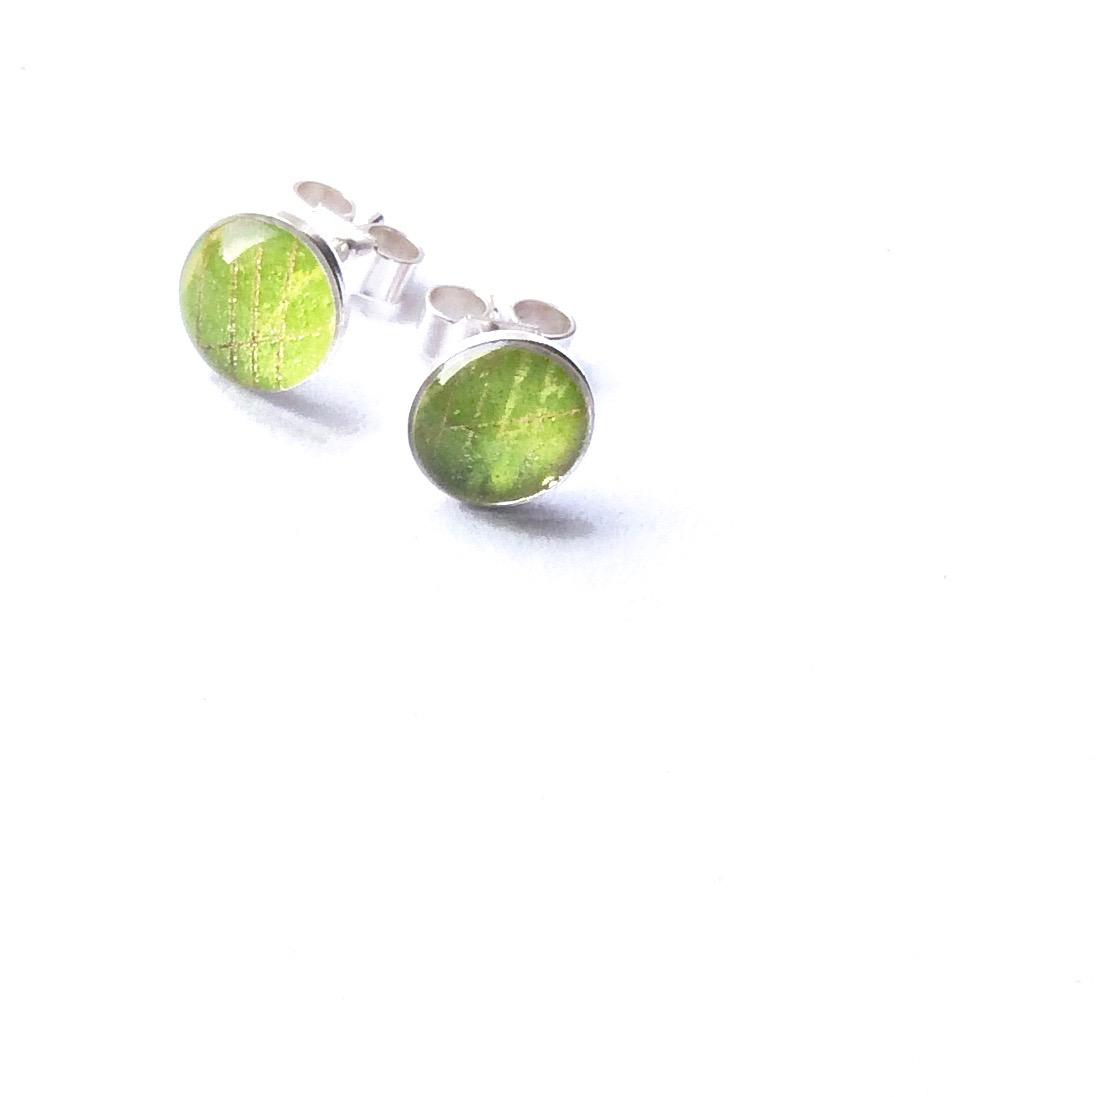 Studs - Lemony/Green